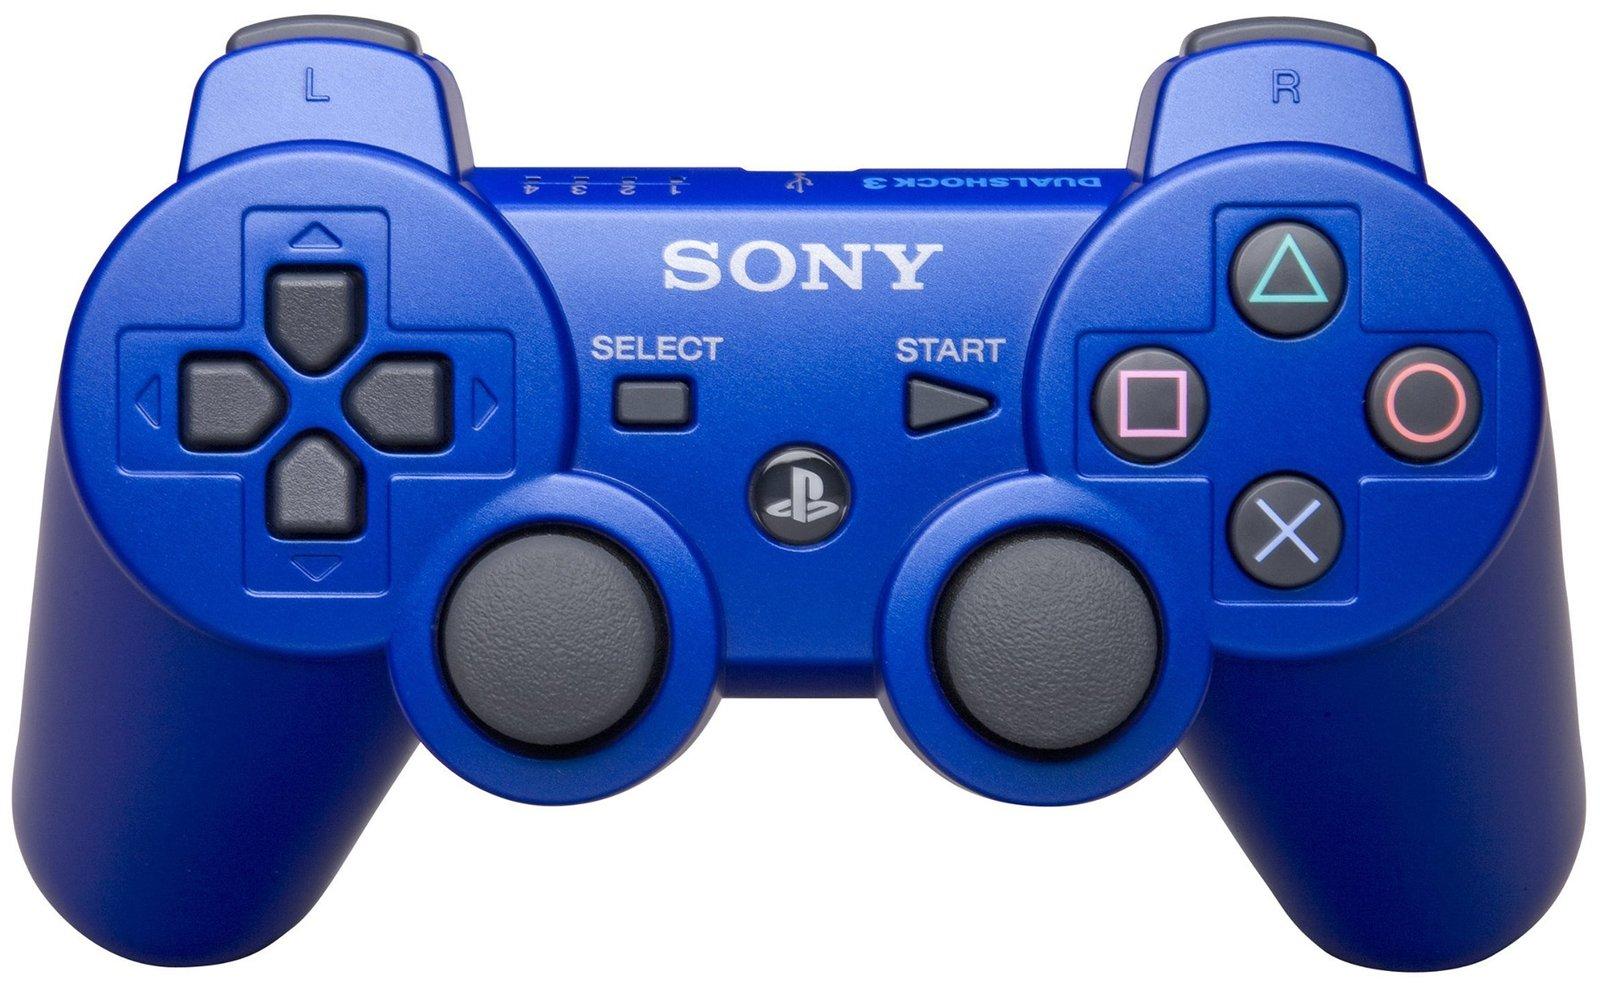 Playstation 3 Filme Streamen